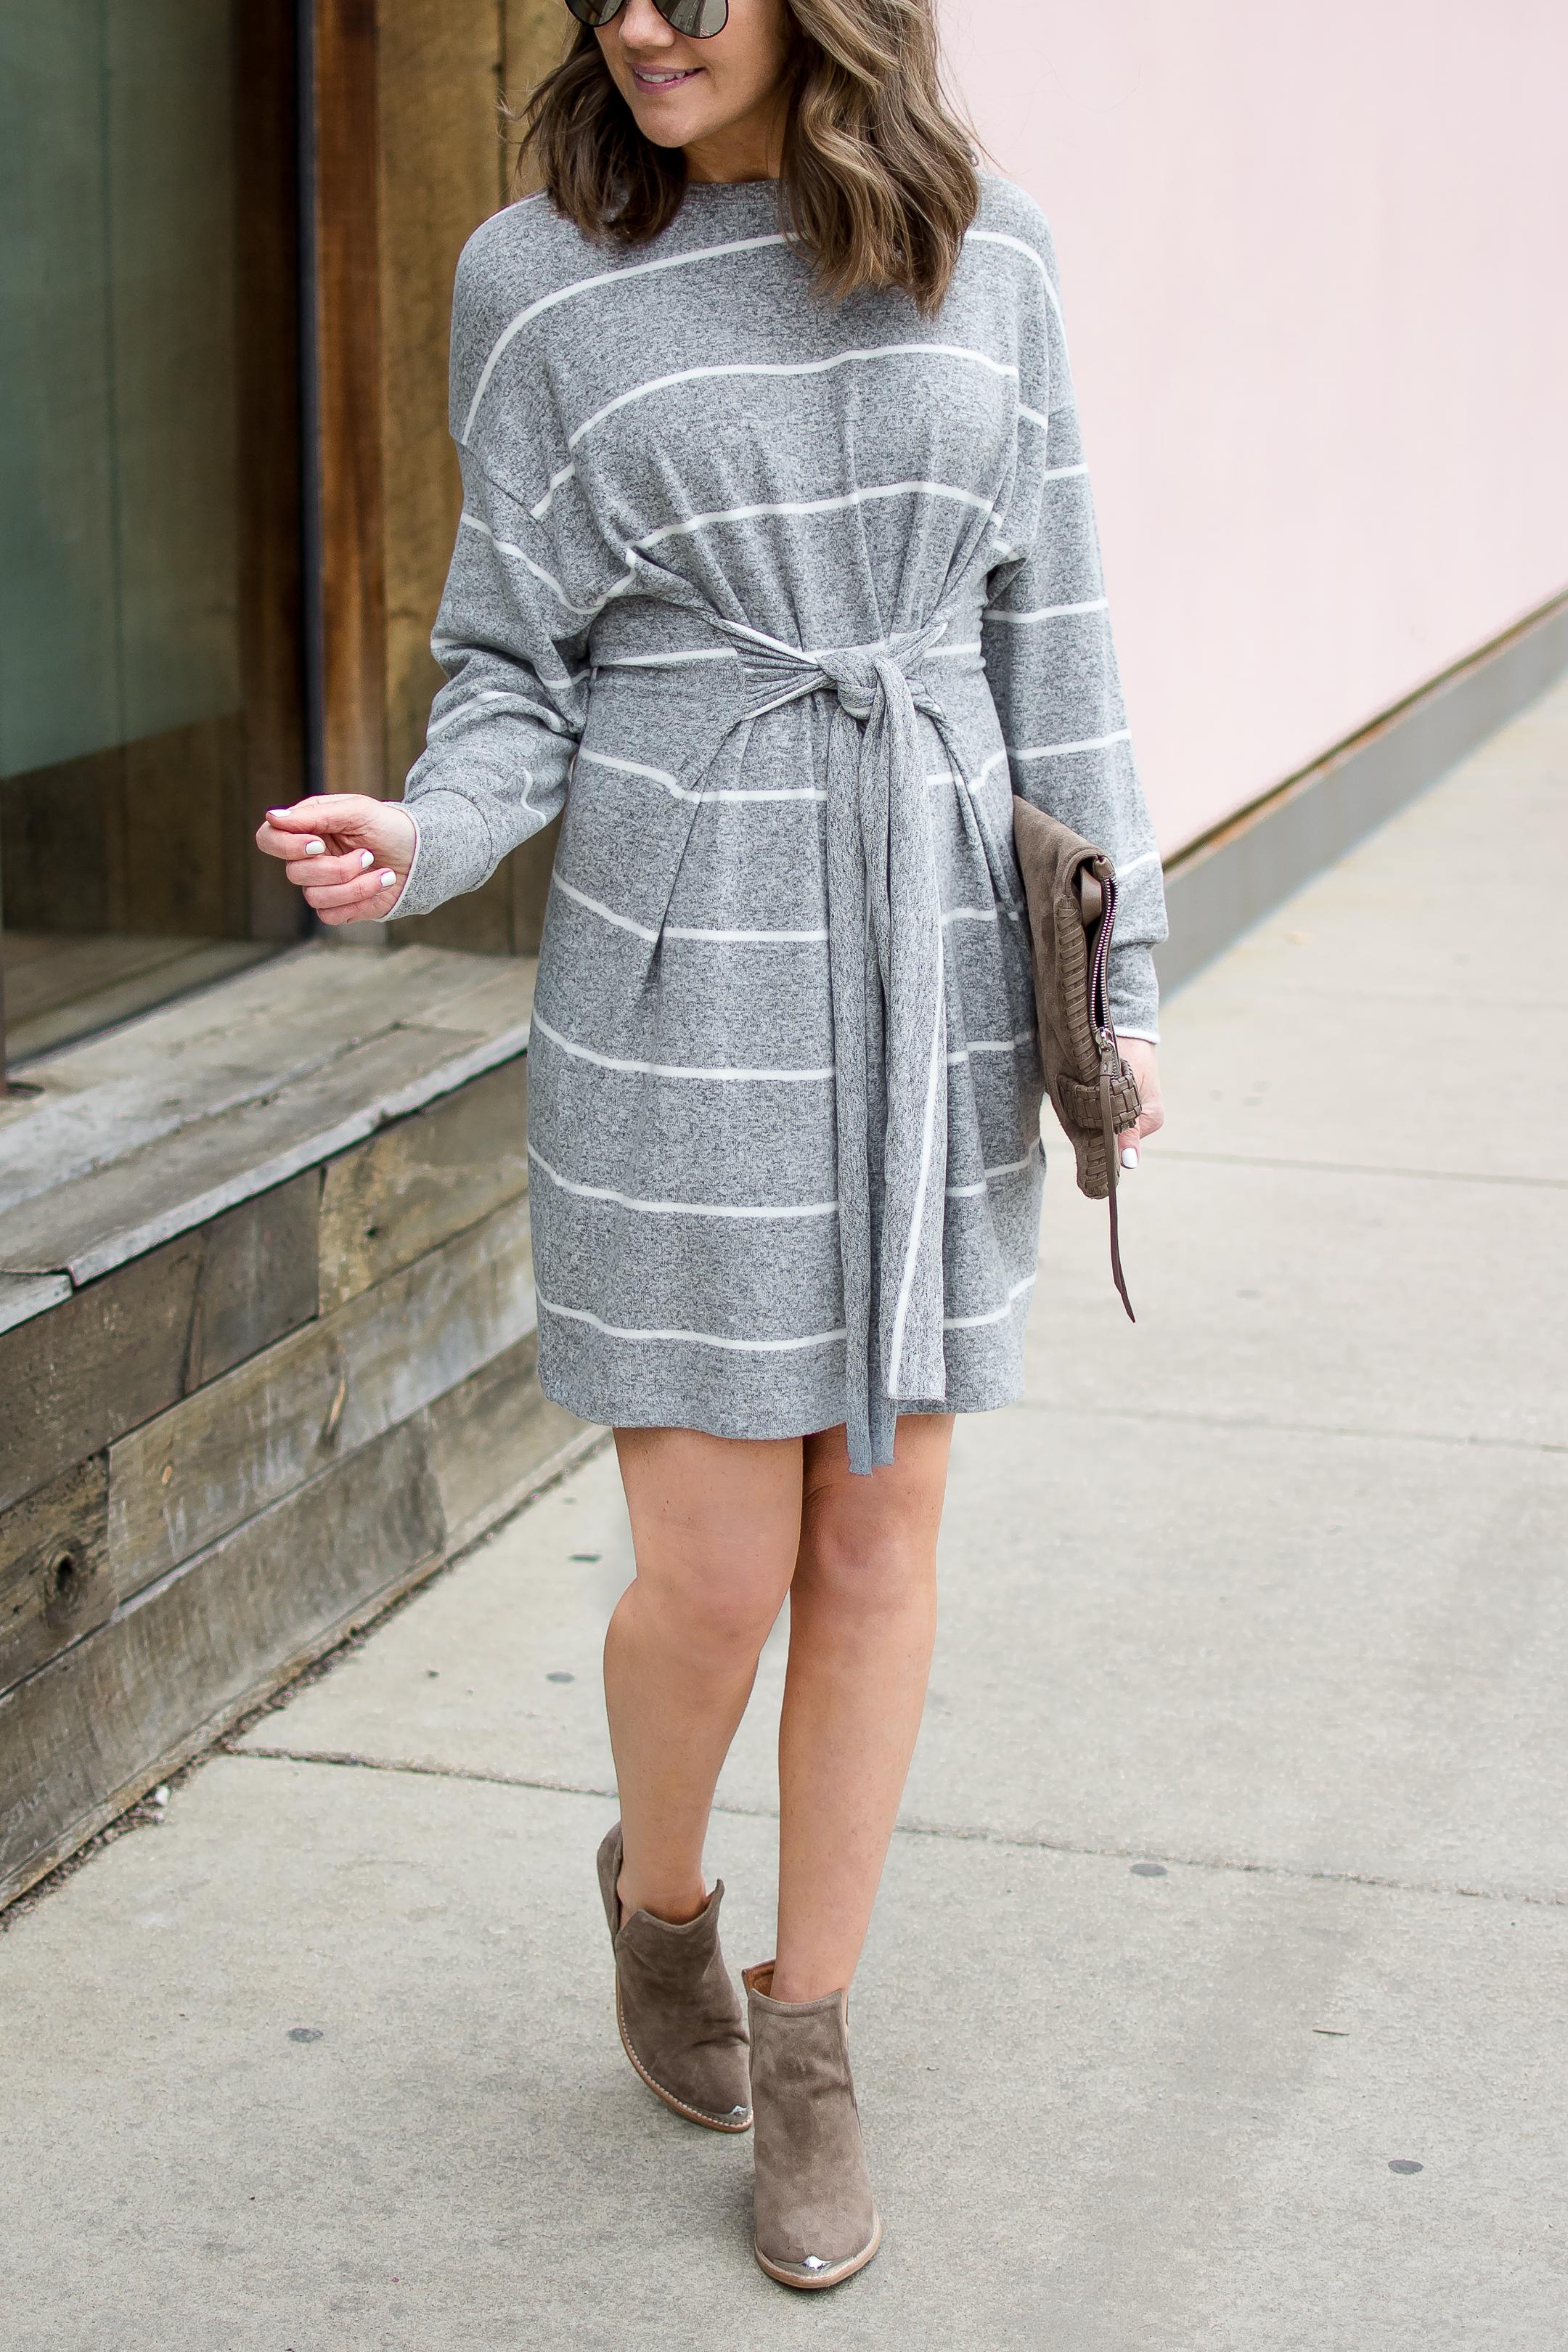 grey tie front dress, sweatshirt dress, the most flattering dress silhouette, spring neutrals, Topshop self tie sweater dress